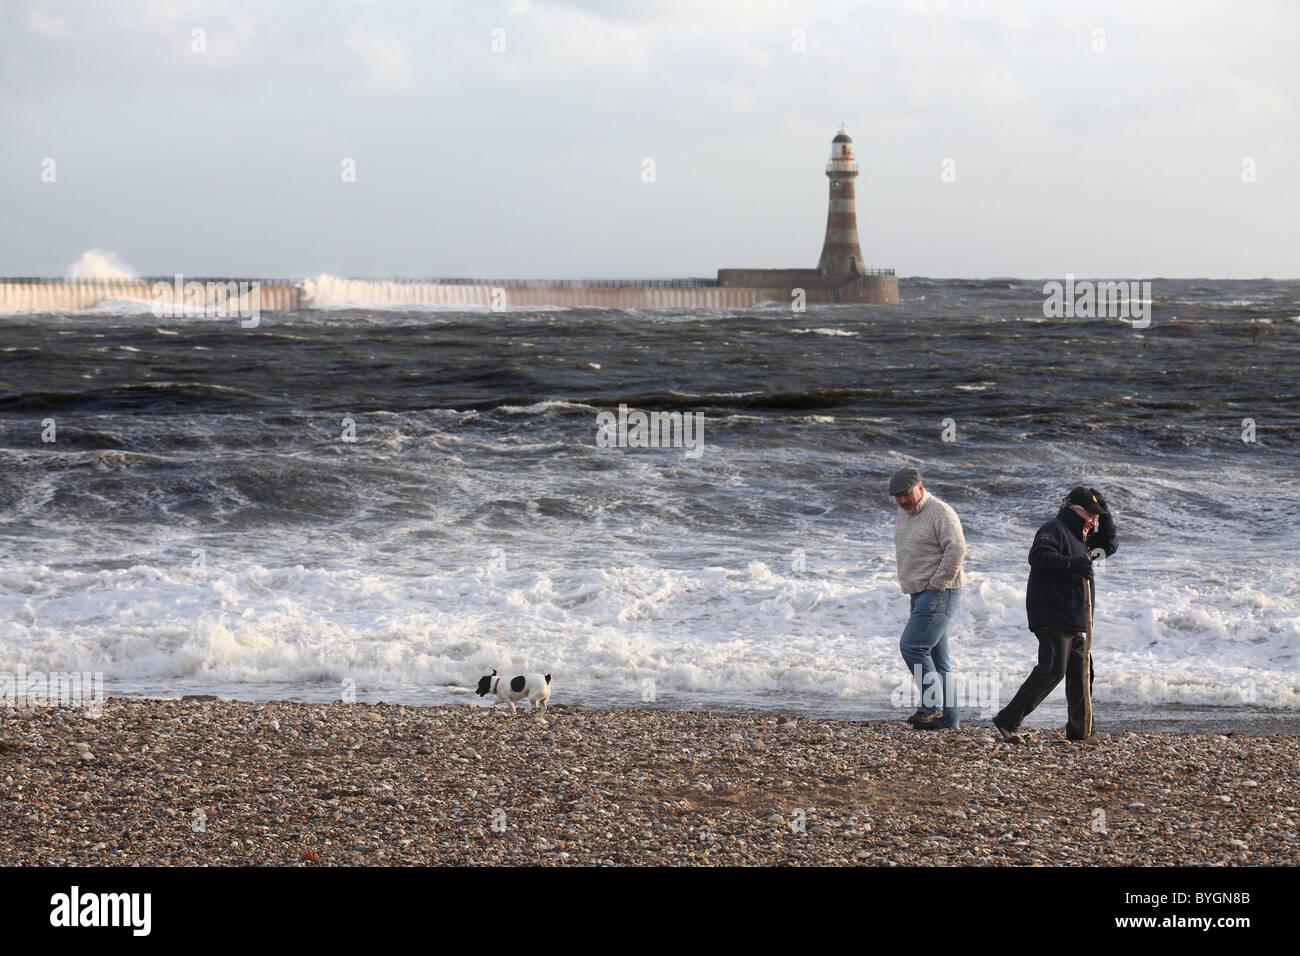 men-walking-on-roker-beach-with-a-dog-in